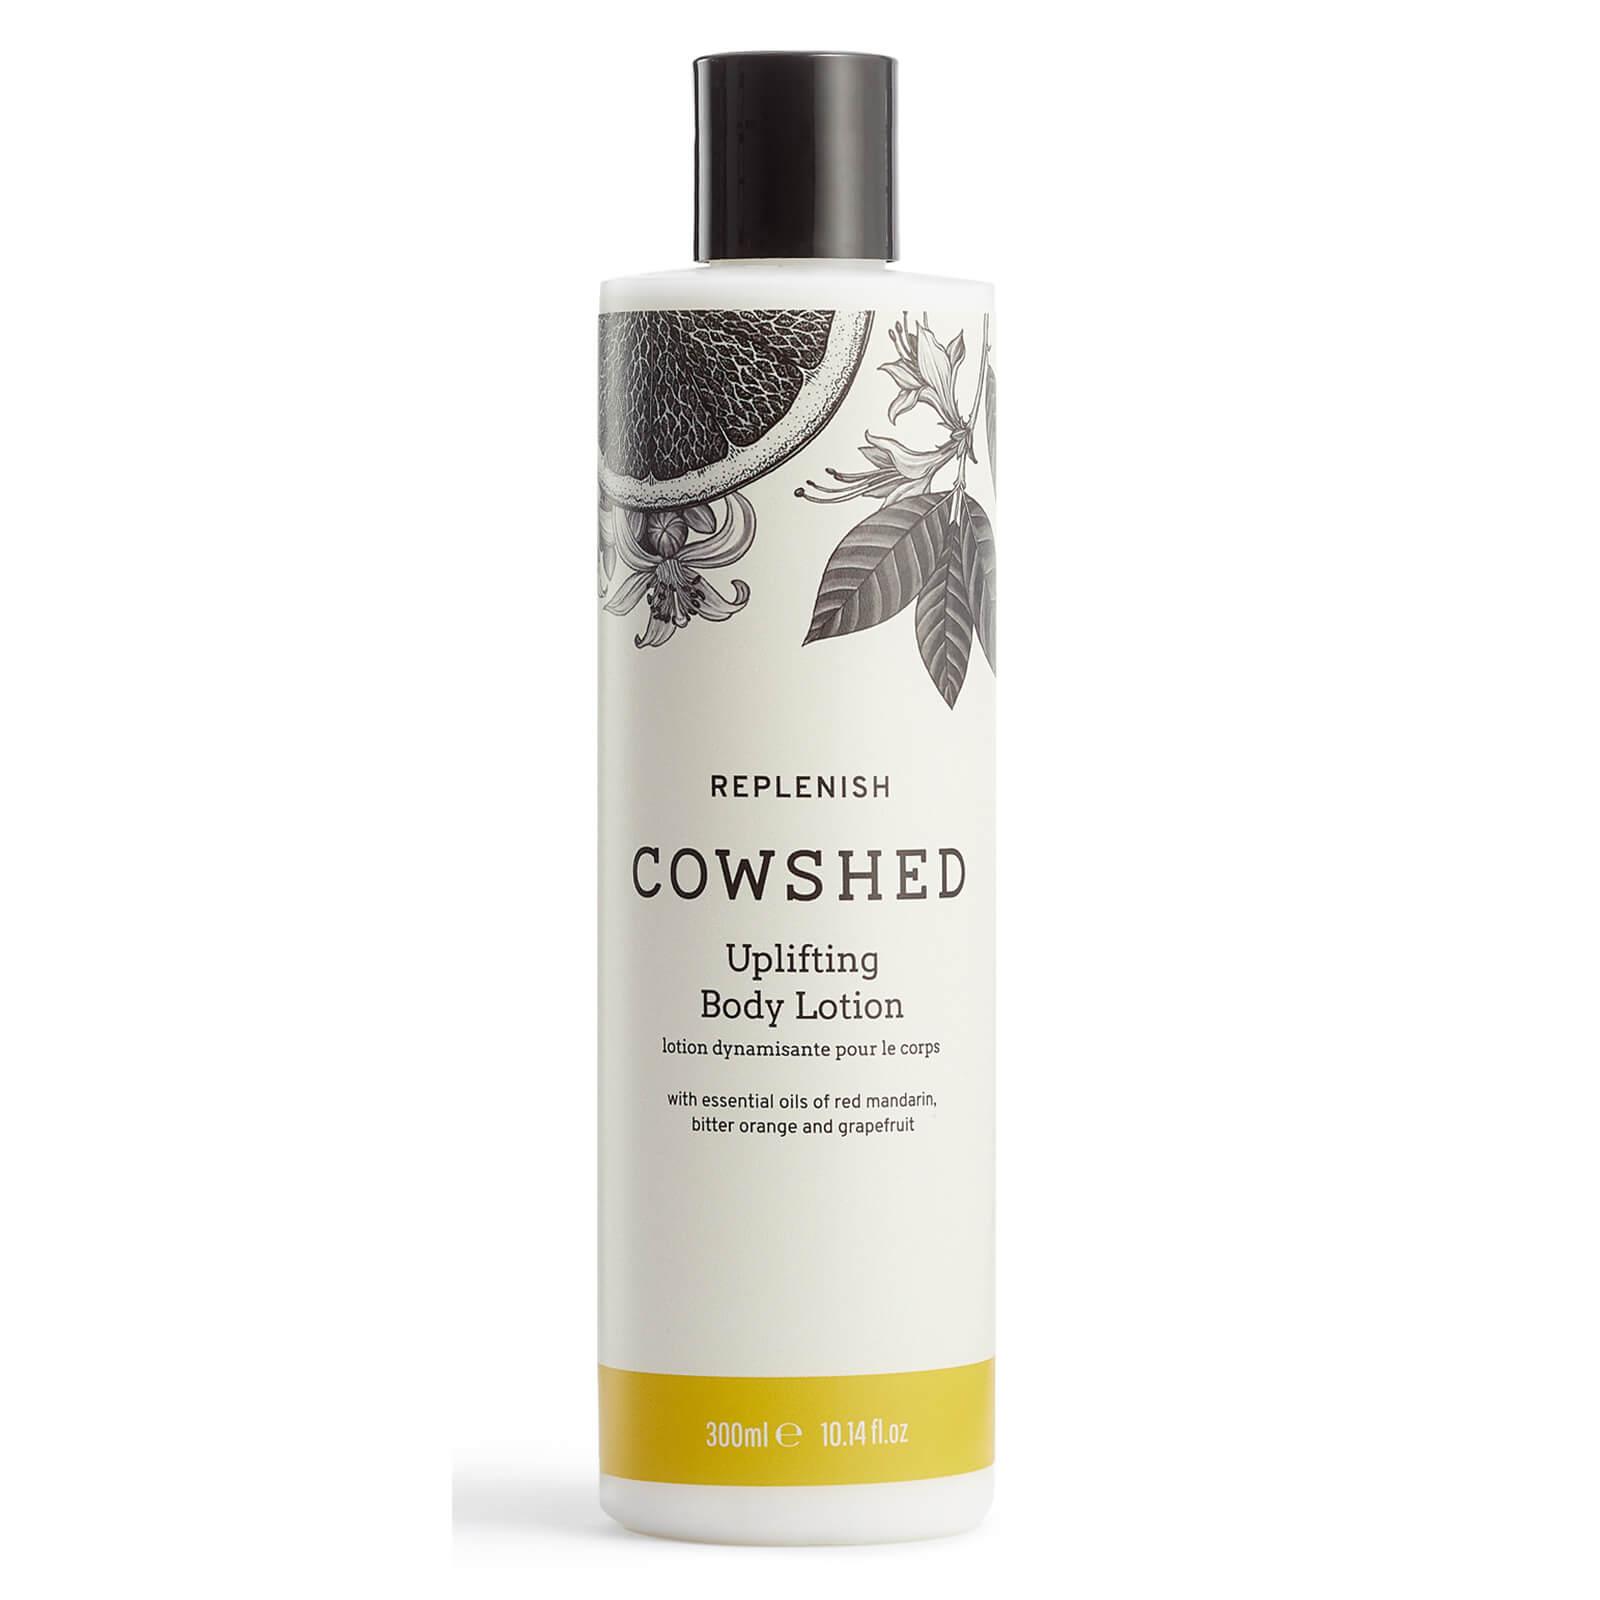 Купить Cowshed REPLENISH Uplifting Body Lotion 300ml